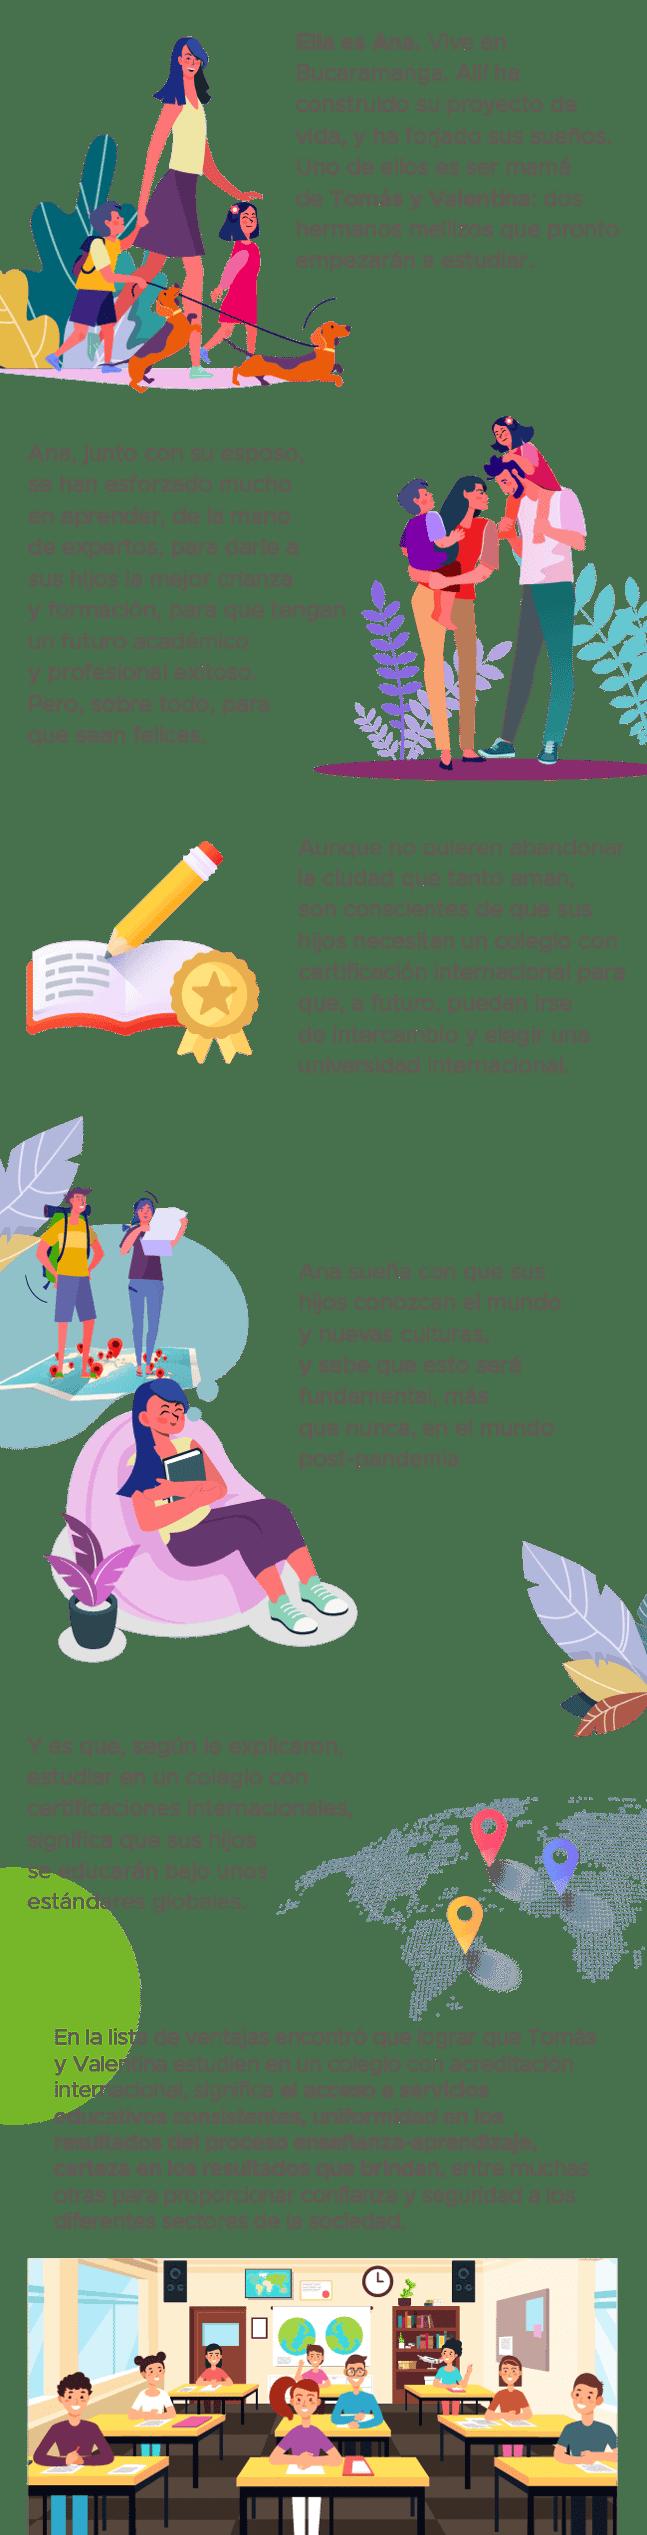 Infografico_2 Colegios Bucaramanga (2)